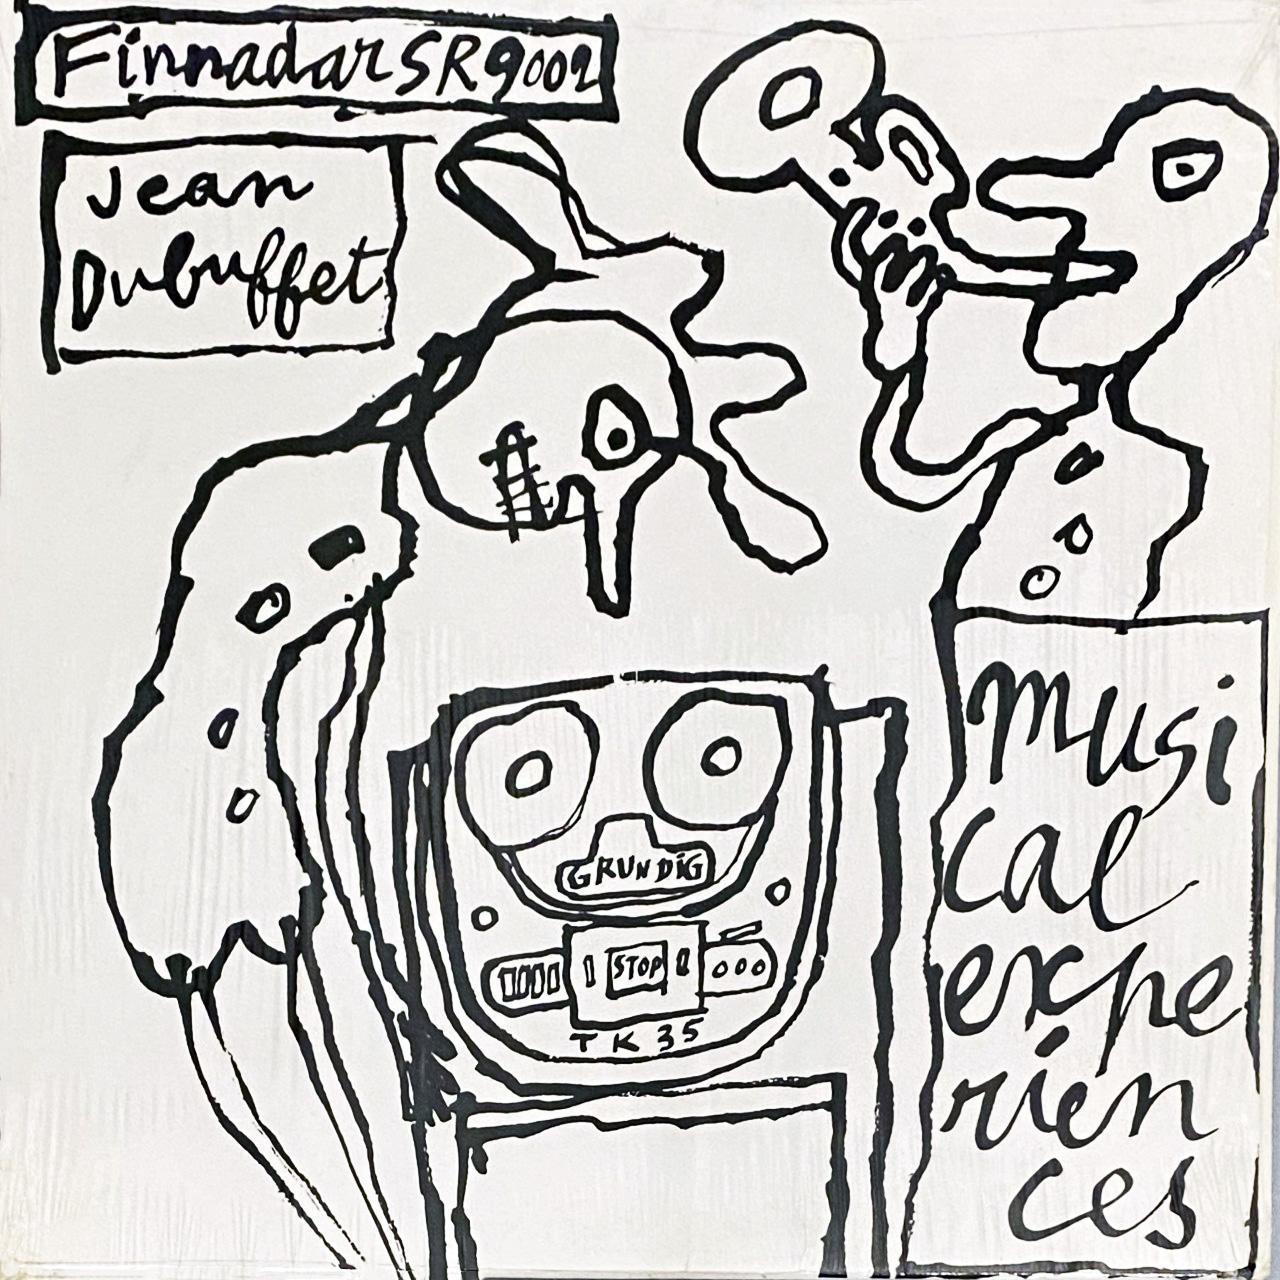 Jean Dubuffet Musical Experiences (Jean Dubuffet record art)